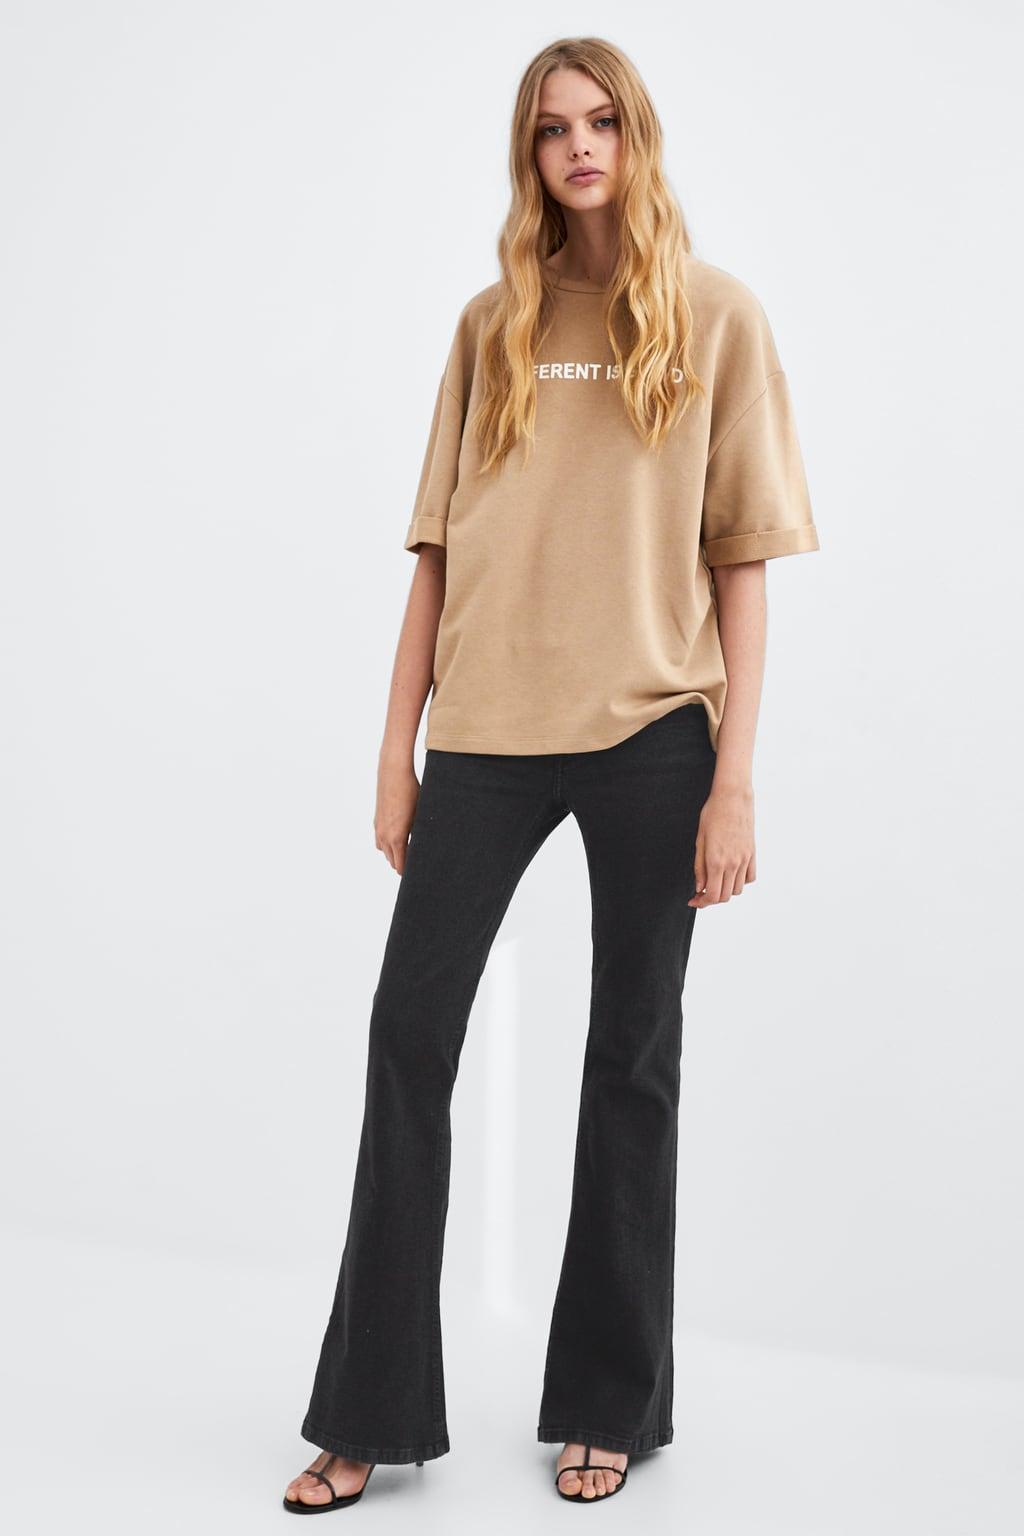 plush-t--shirt-with-textgraphic-&-slogans-t-shirts-woman by zara